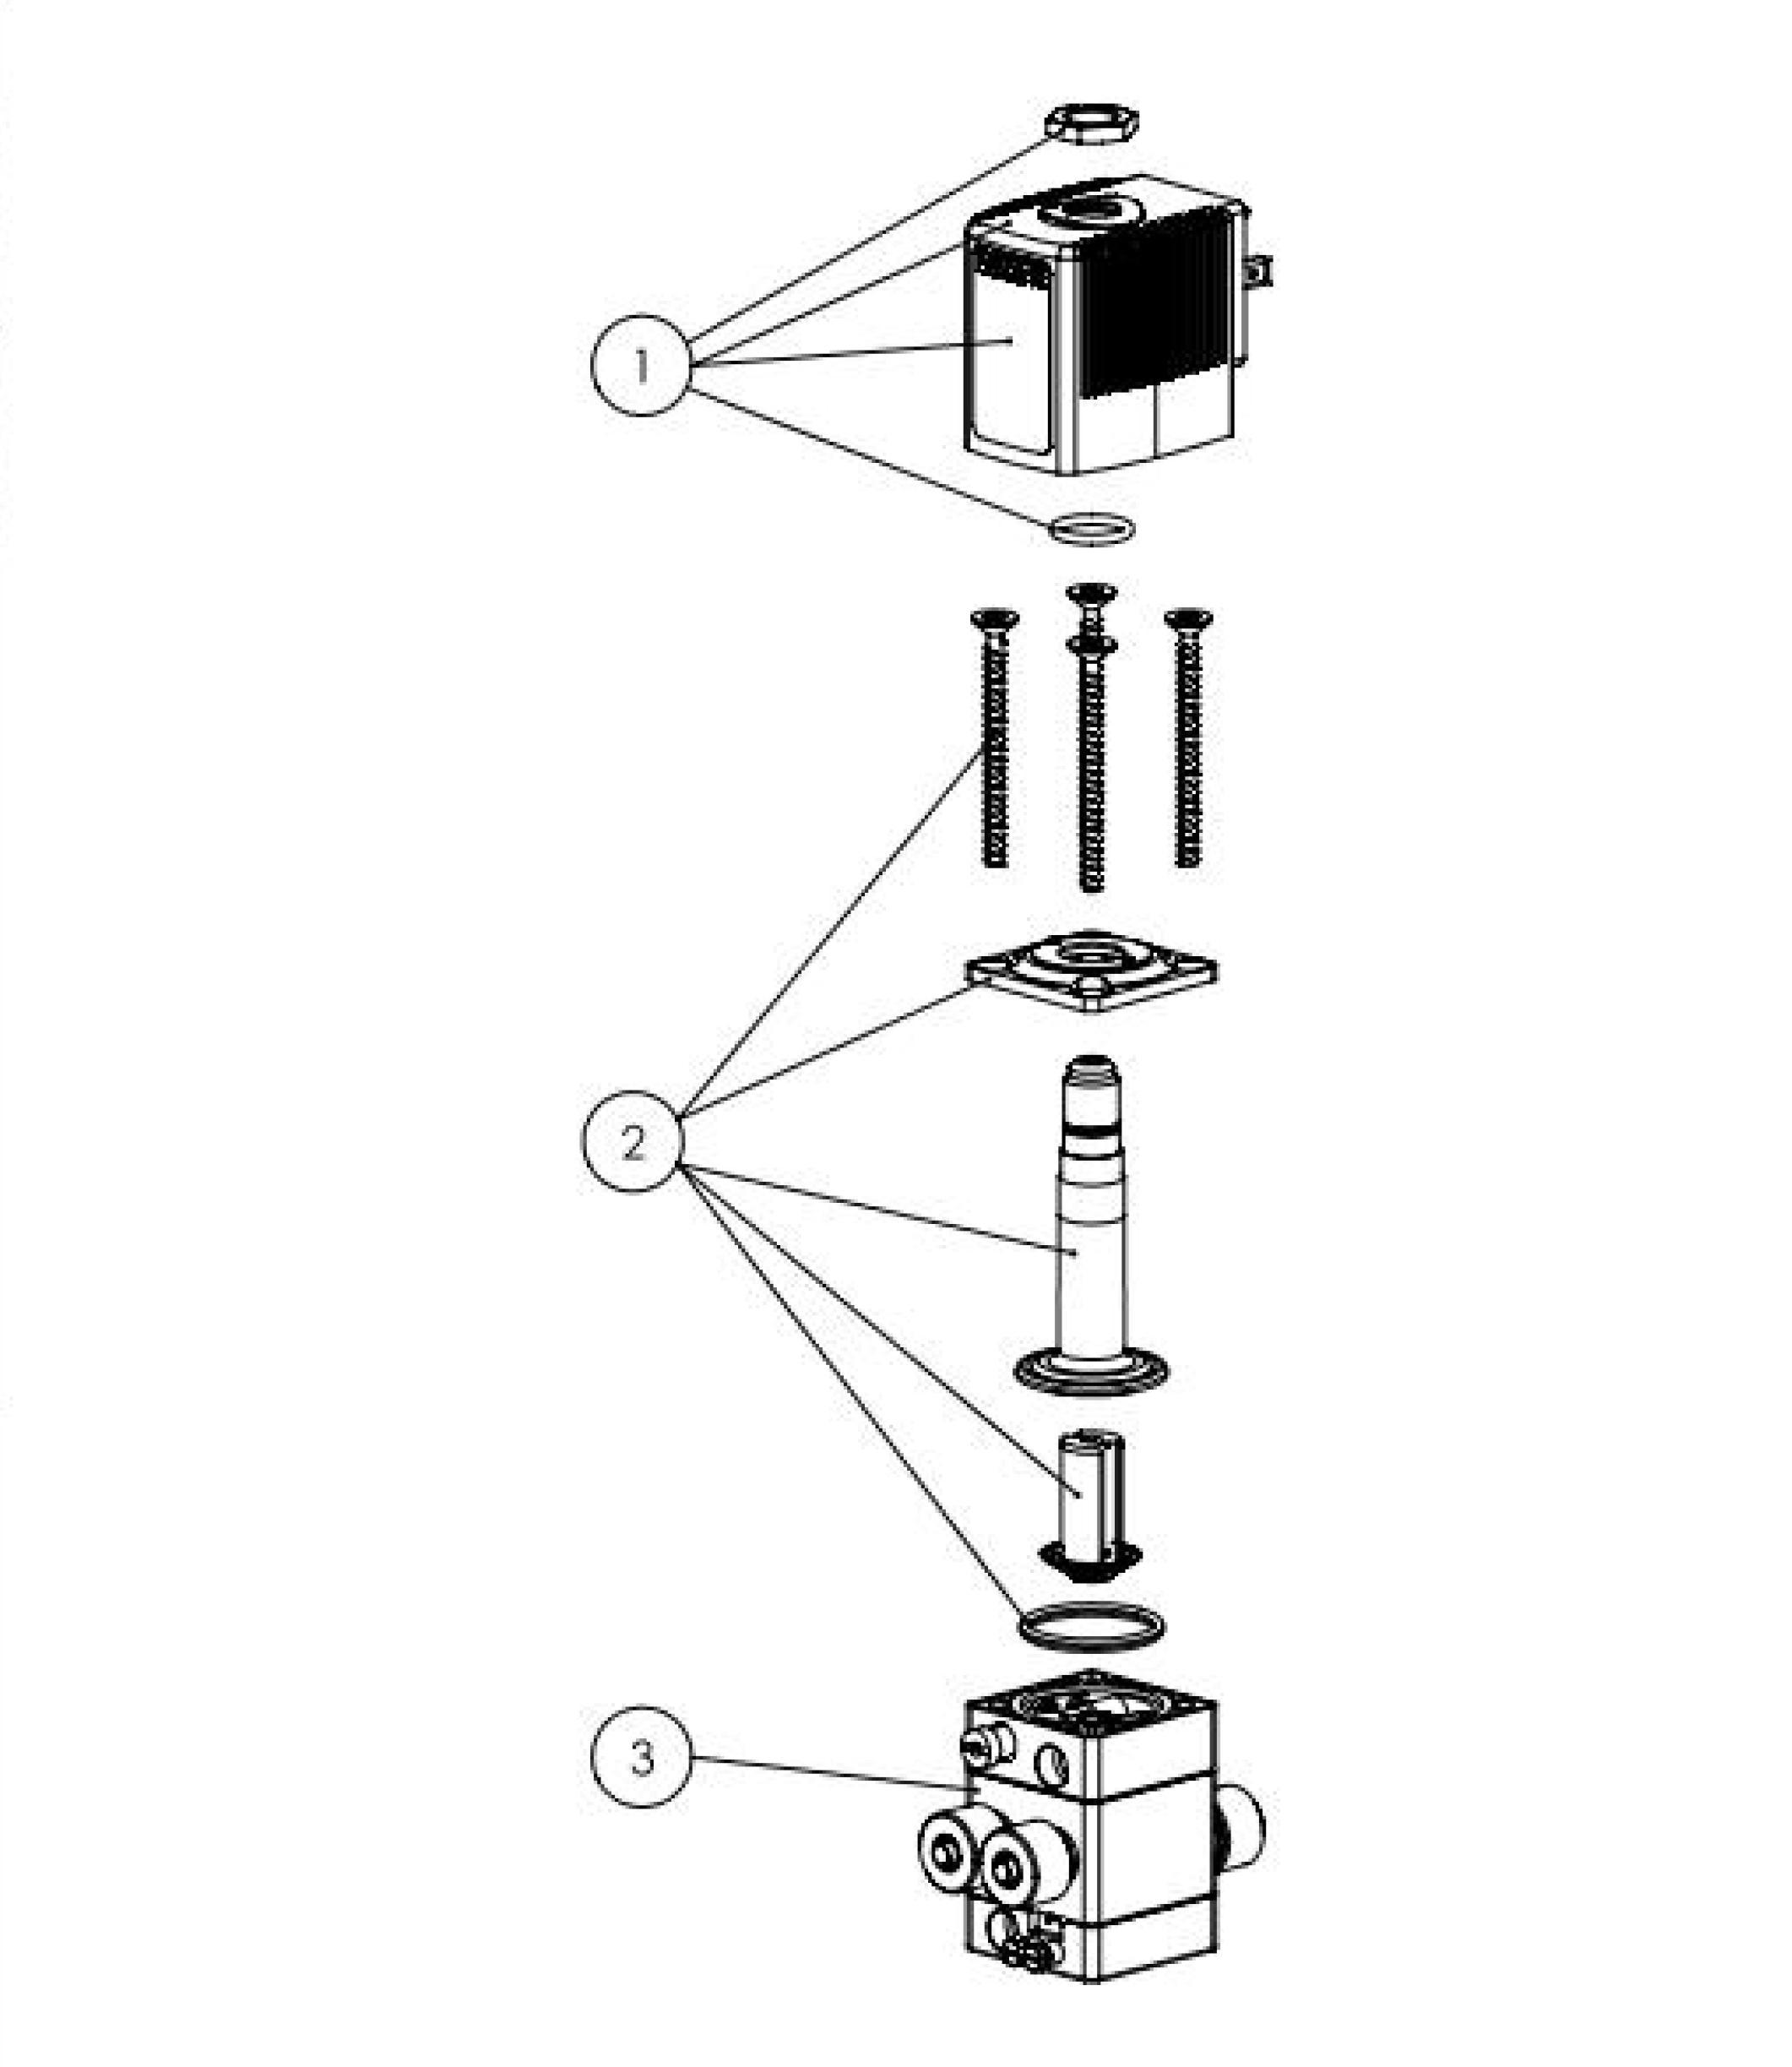 type 5420  2 way solenoid valve for pneumatics